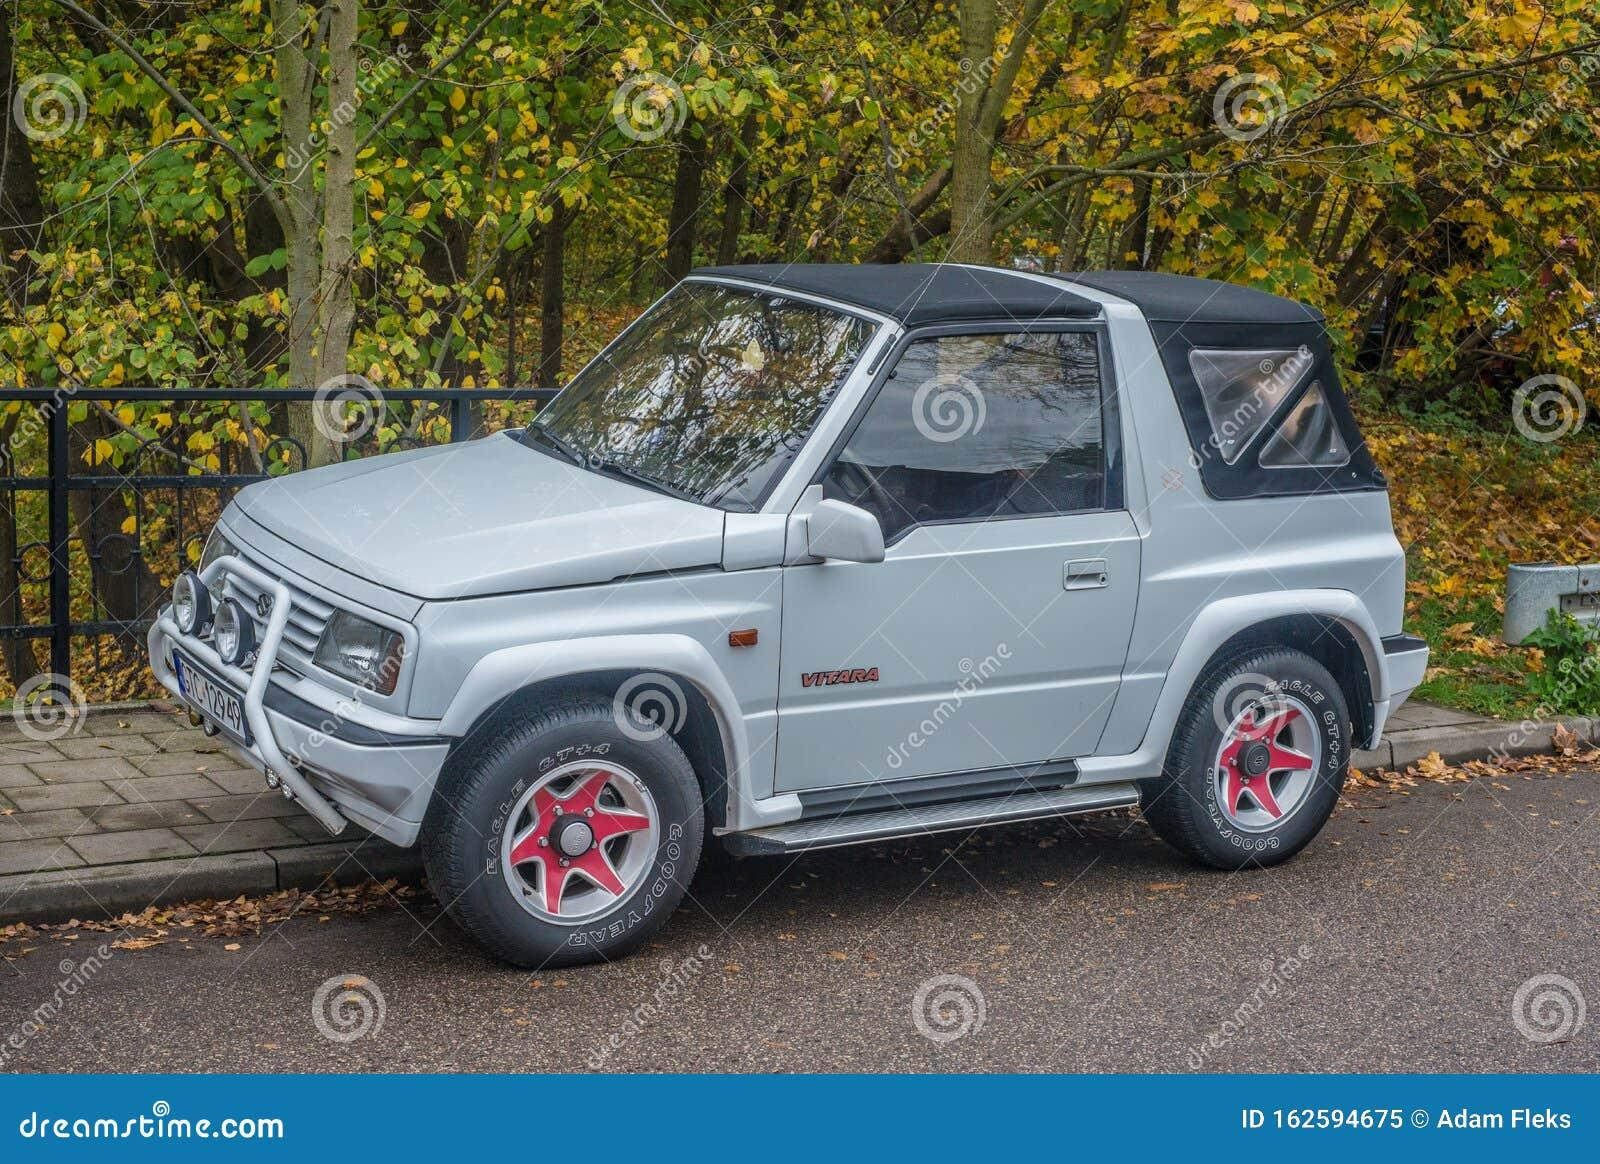 692 Suzuki Vitara Photos Free Royalty Free Stock Photos From Dreamstime